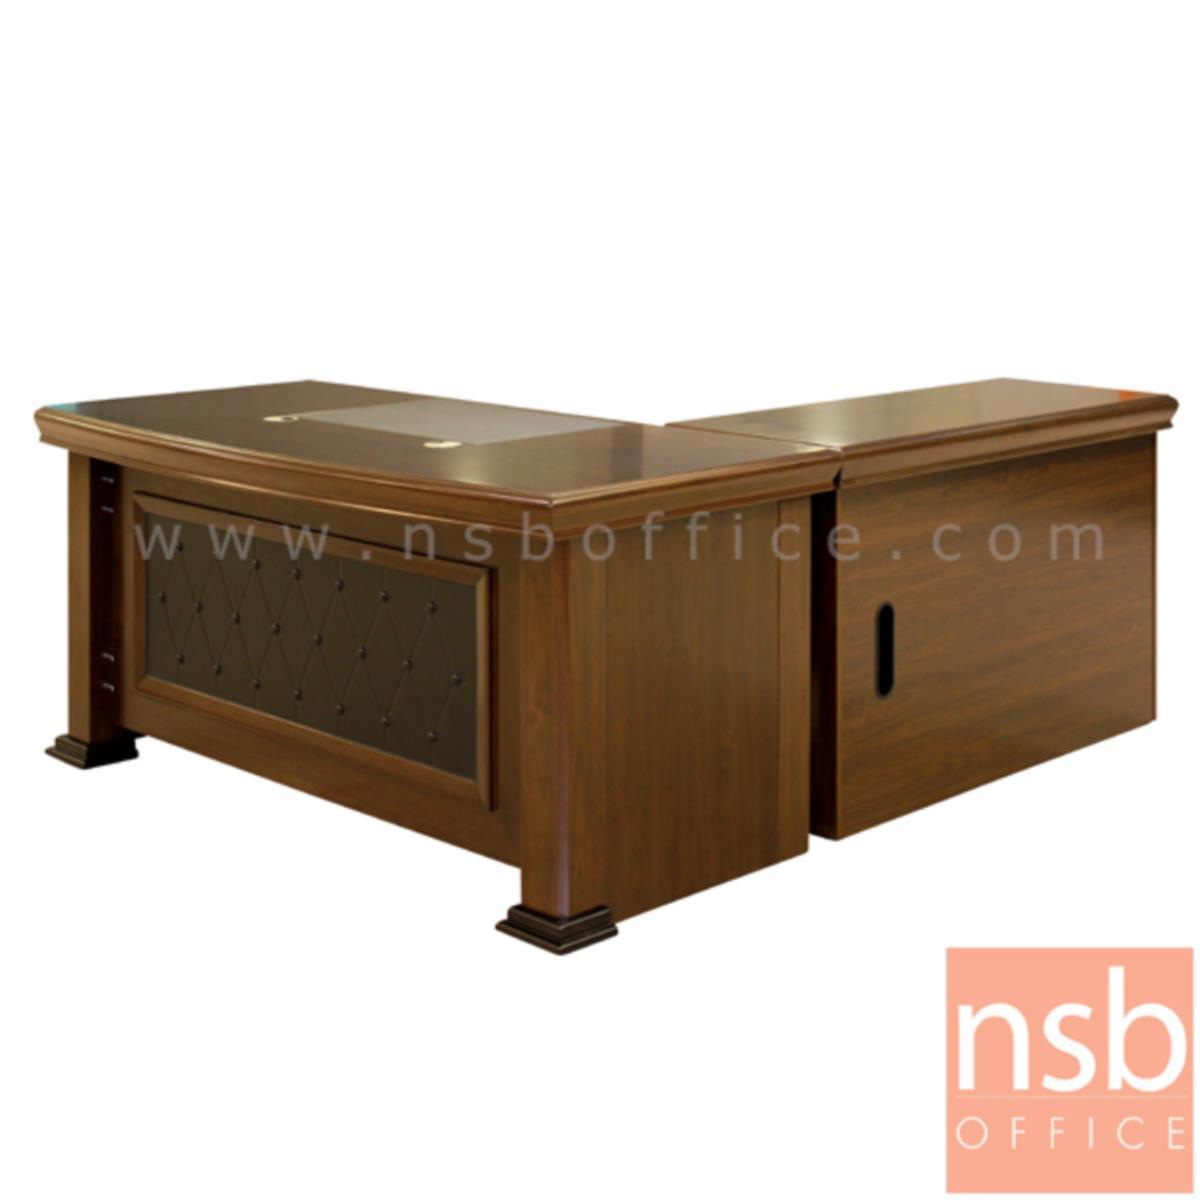 A06A113:โต๊ะผู้บริหารตัวแอล  รุ่น Nermal (เนอร์มอล) ขนาด 160W ,180W cm.  พร้อมตู้ลิ้นชักและตู้ข้าง